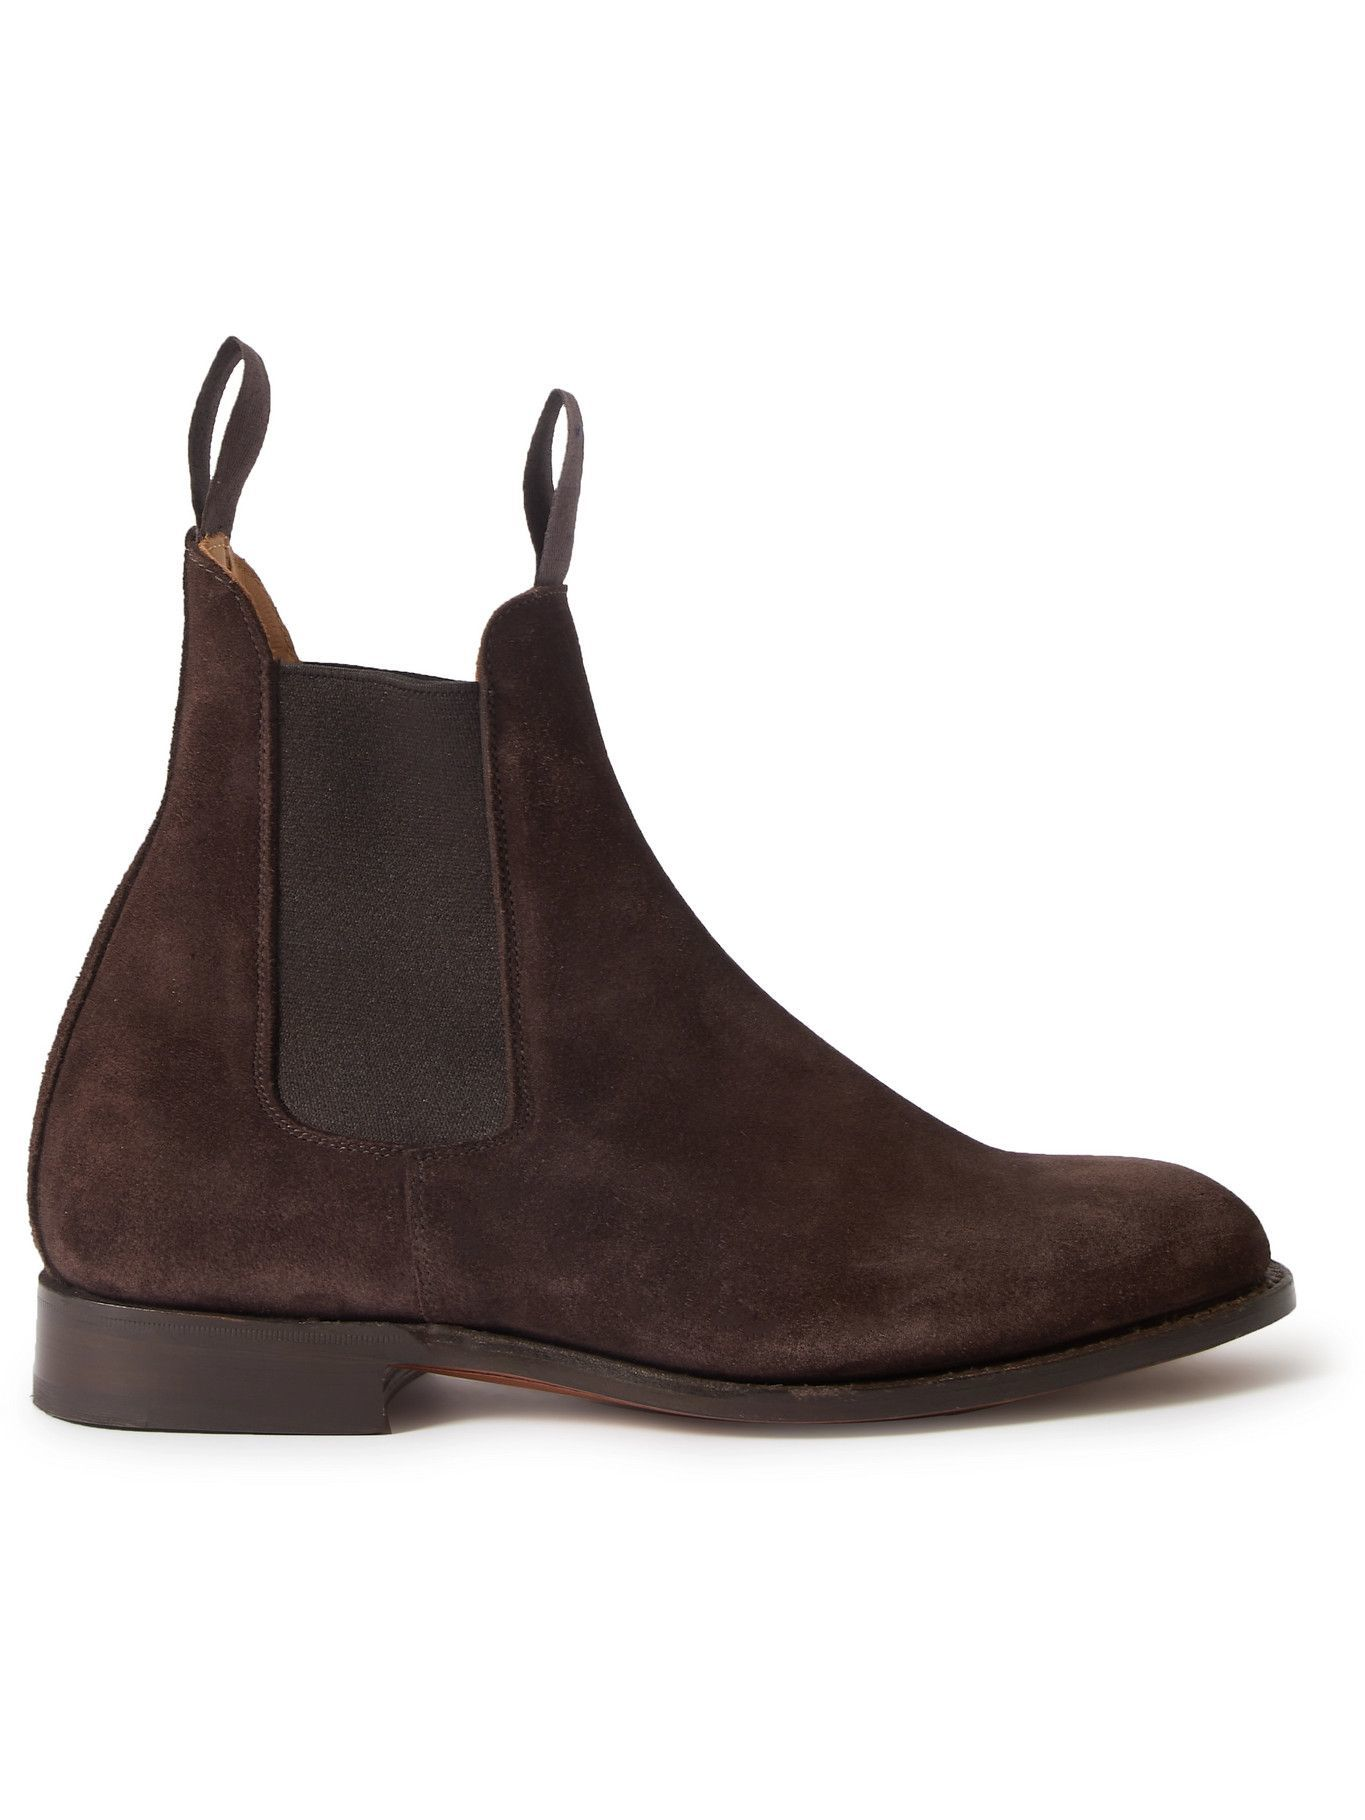 Photo: Tricker's - Gigio Suede Chelsea Boots - Brown